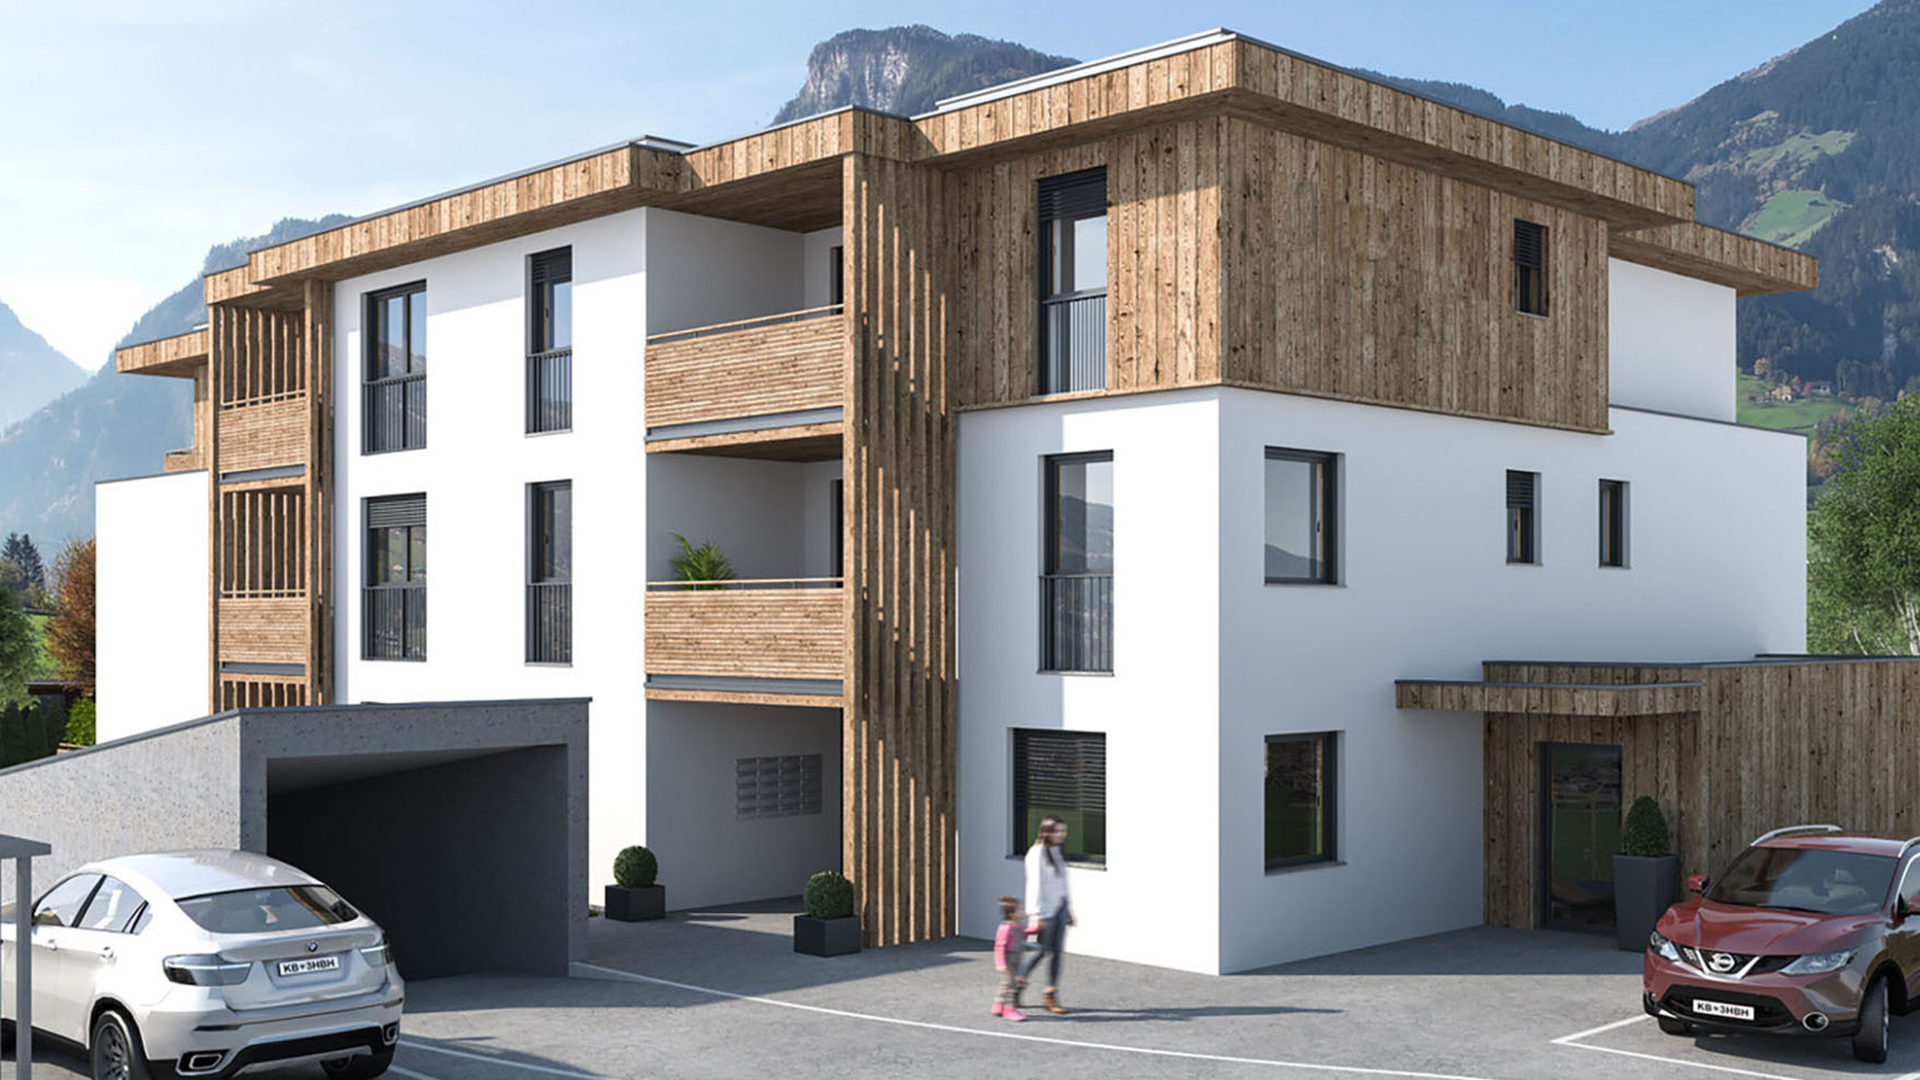 Mayrhofen Residences Apartments, Austria